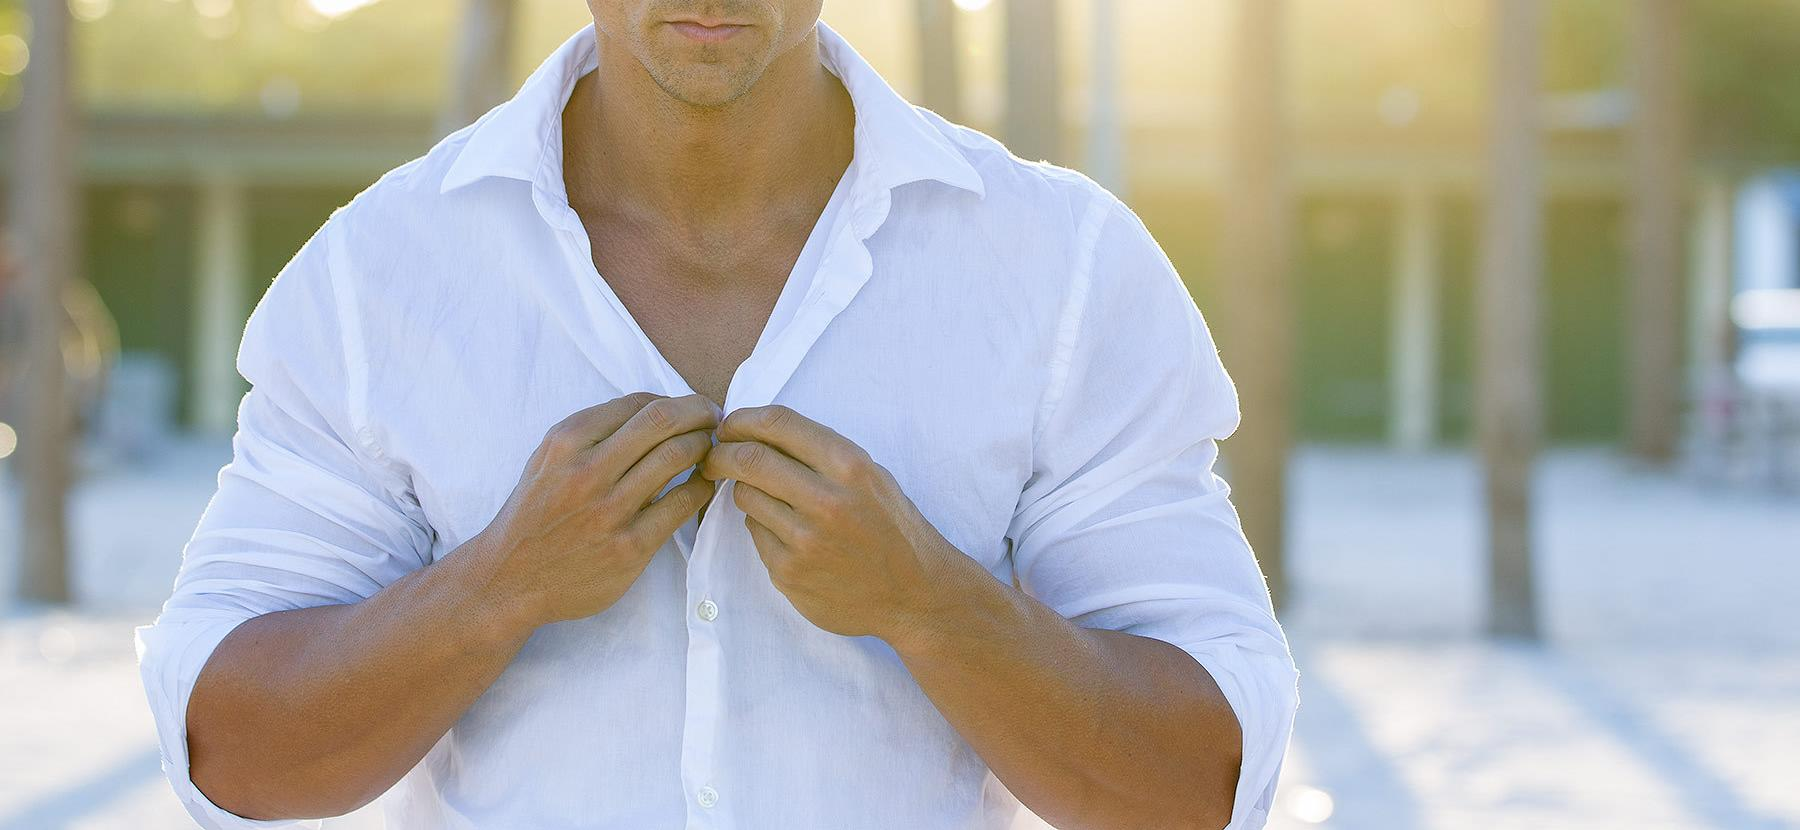 Летние рубашки — выбираем ткани